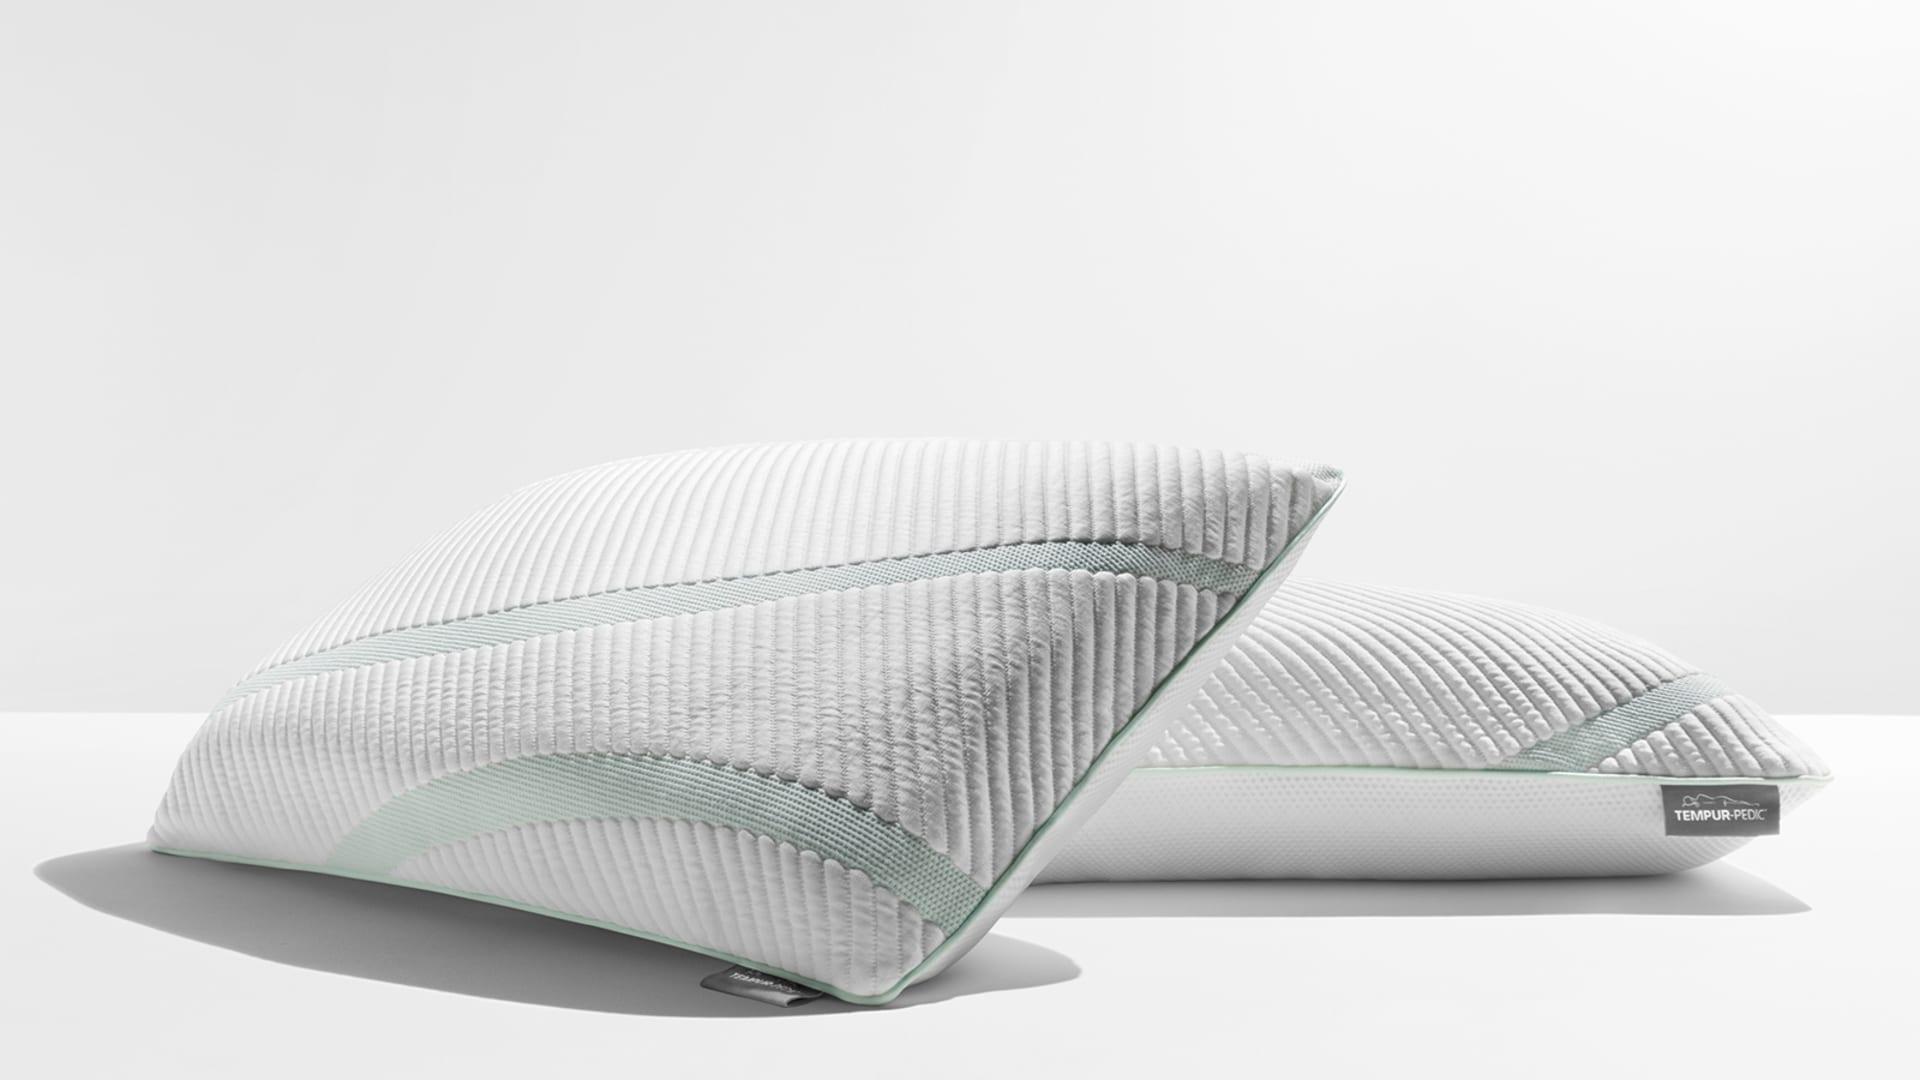 TEMPUR-Adapt Pro Pillow